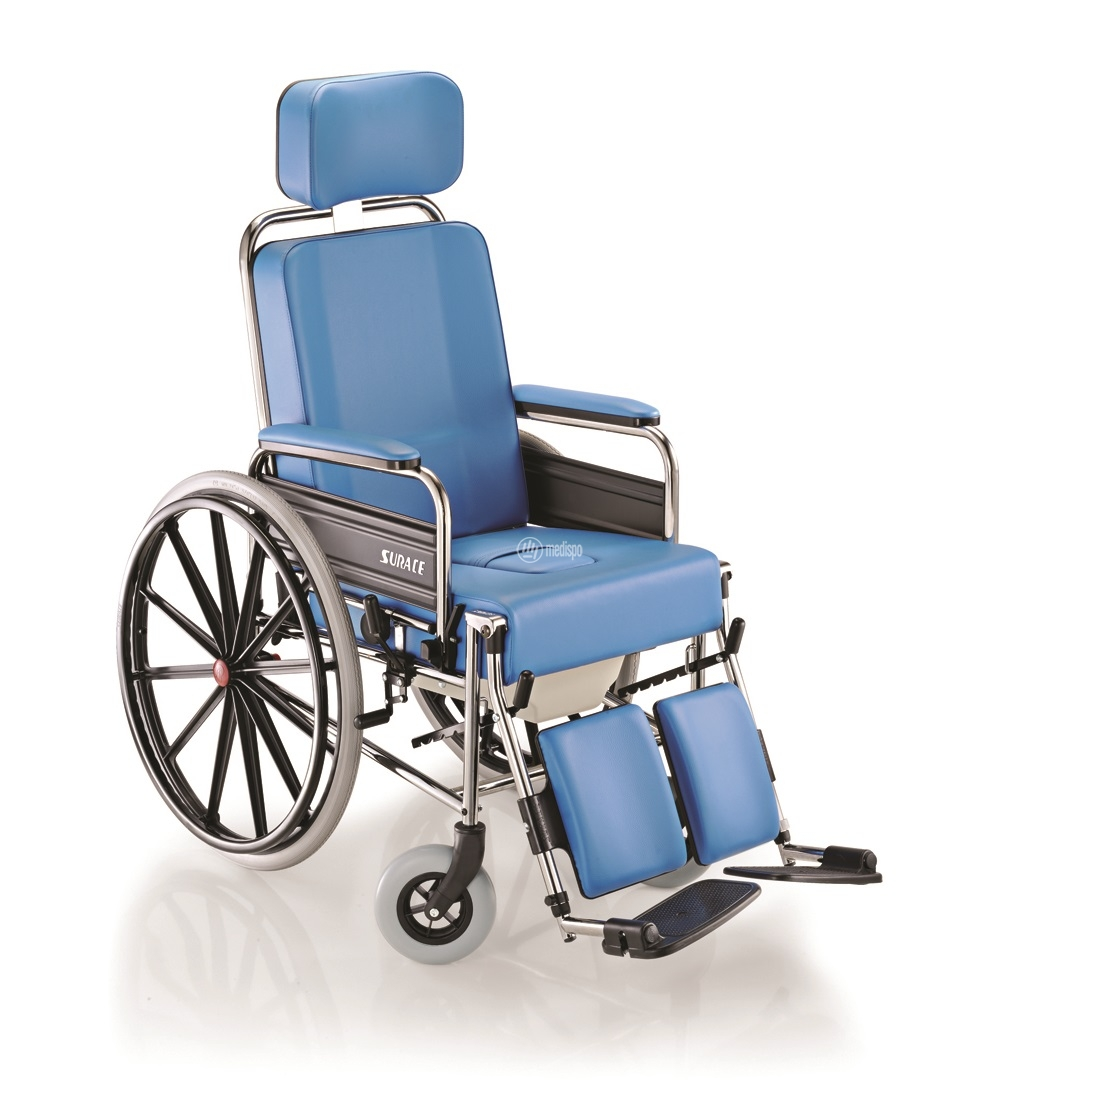 Sedia rotelle comoda imbottita con Wc Surace